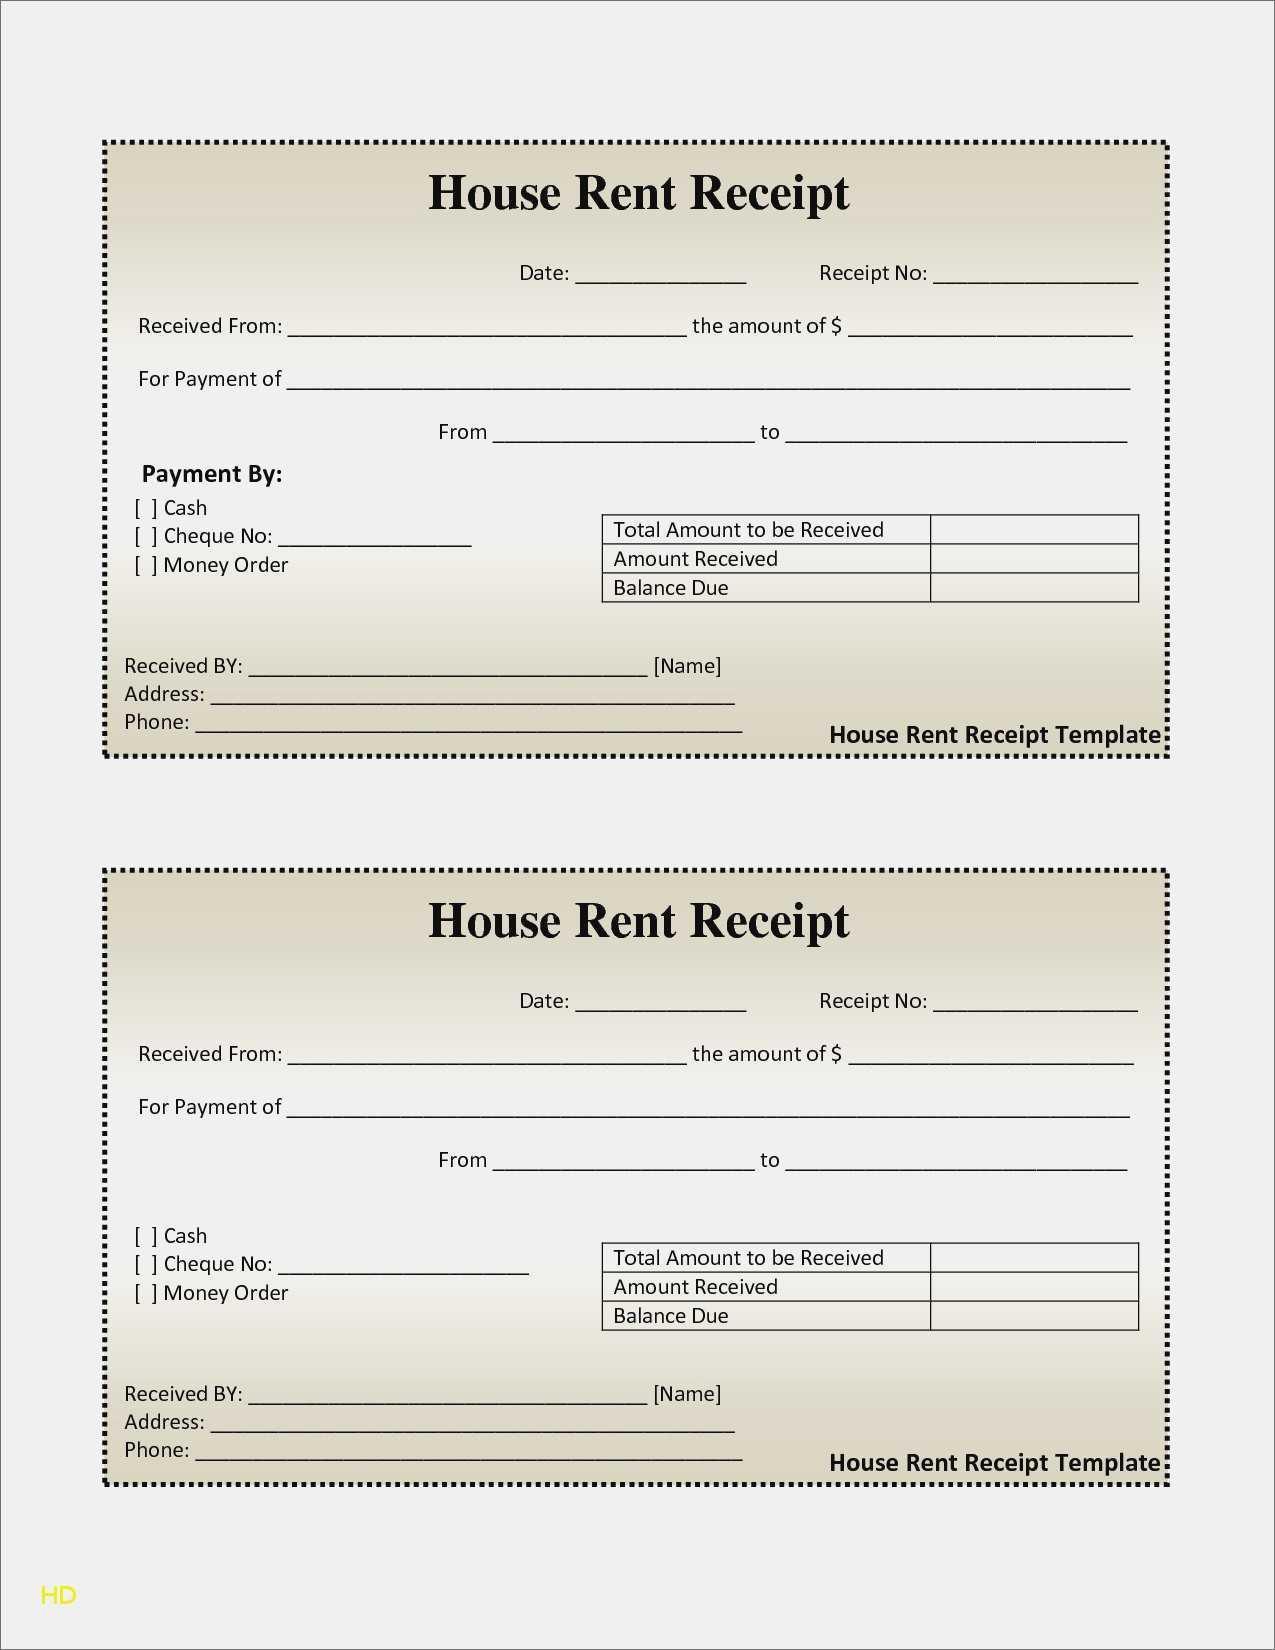 Free Printable Rent Receipts Templates